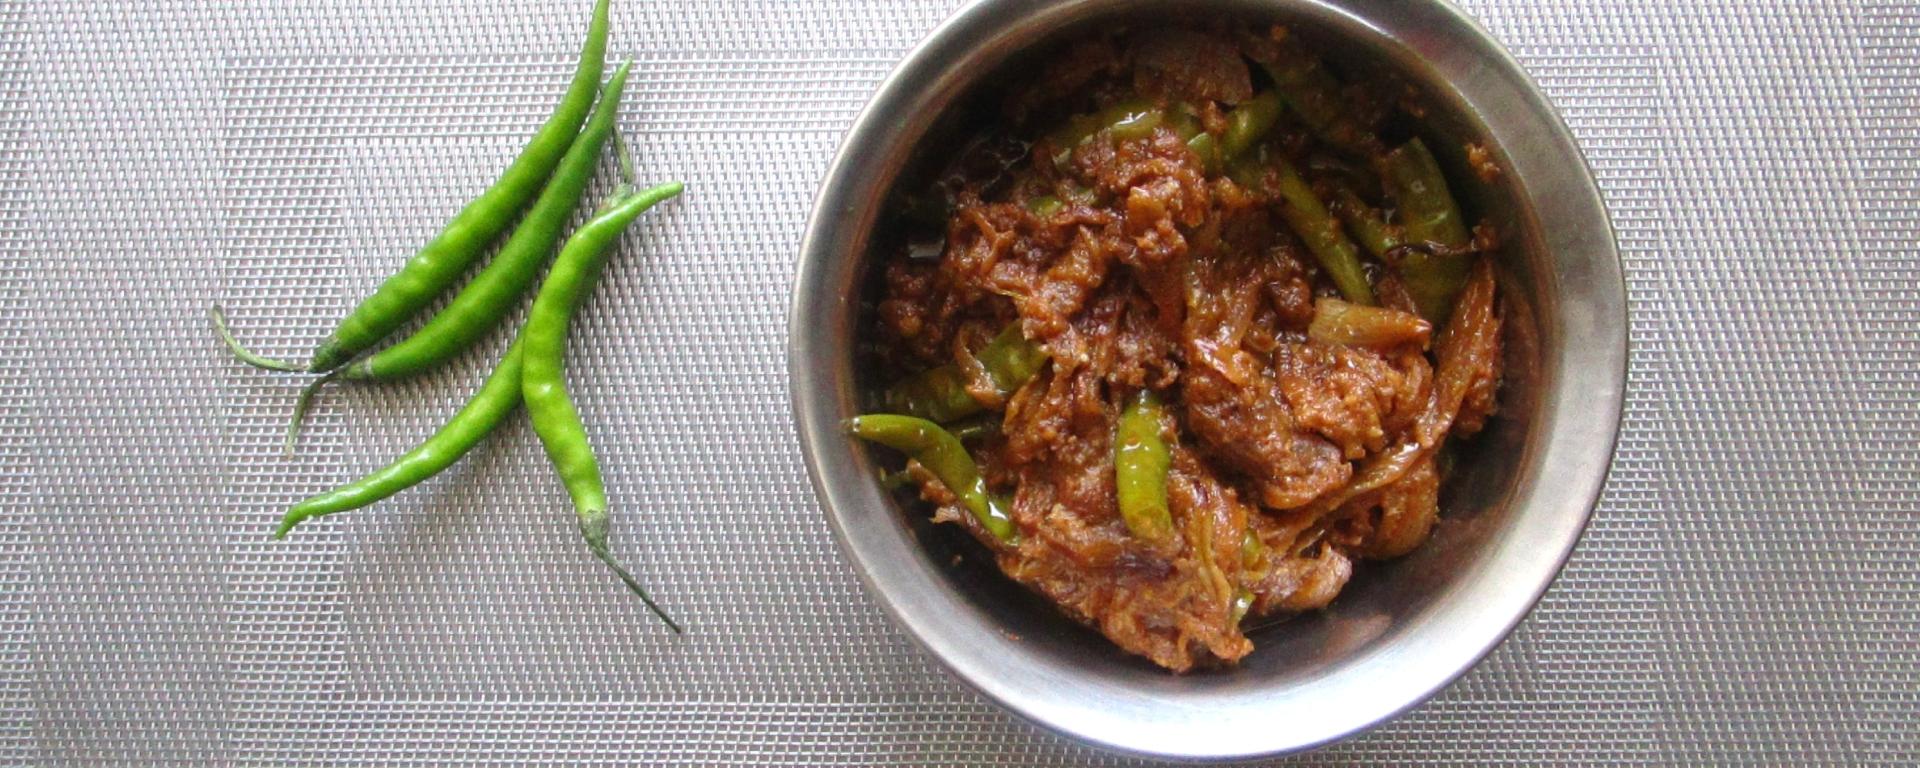 Hari Mirch ki Sabzi foodeezjunction.com